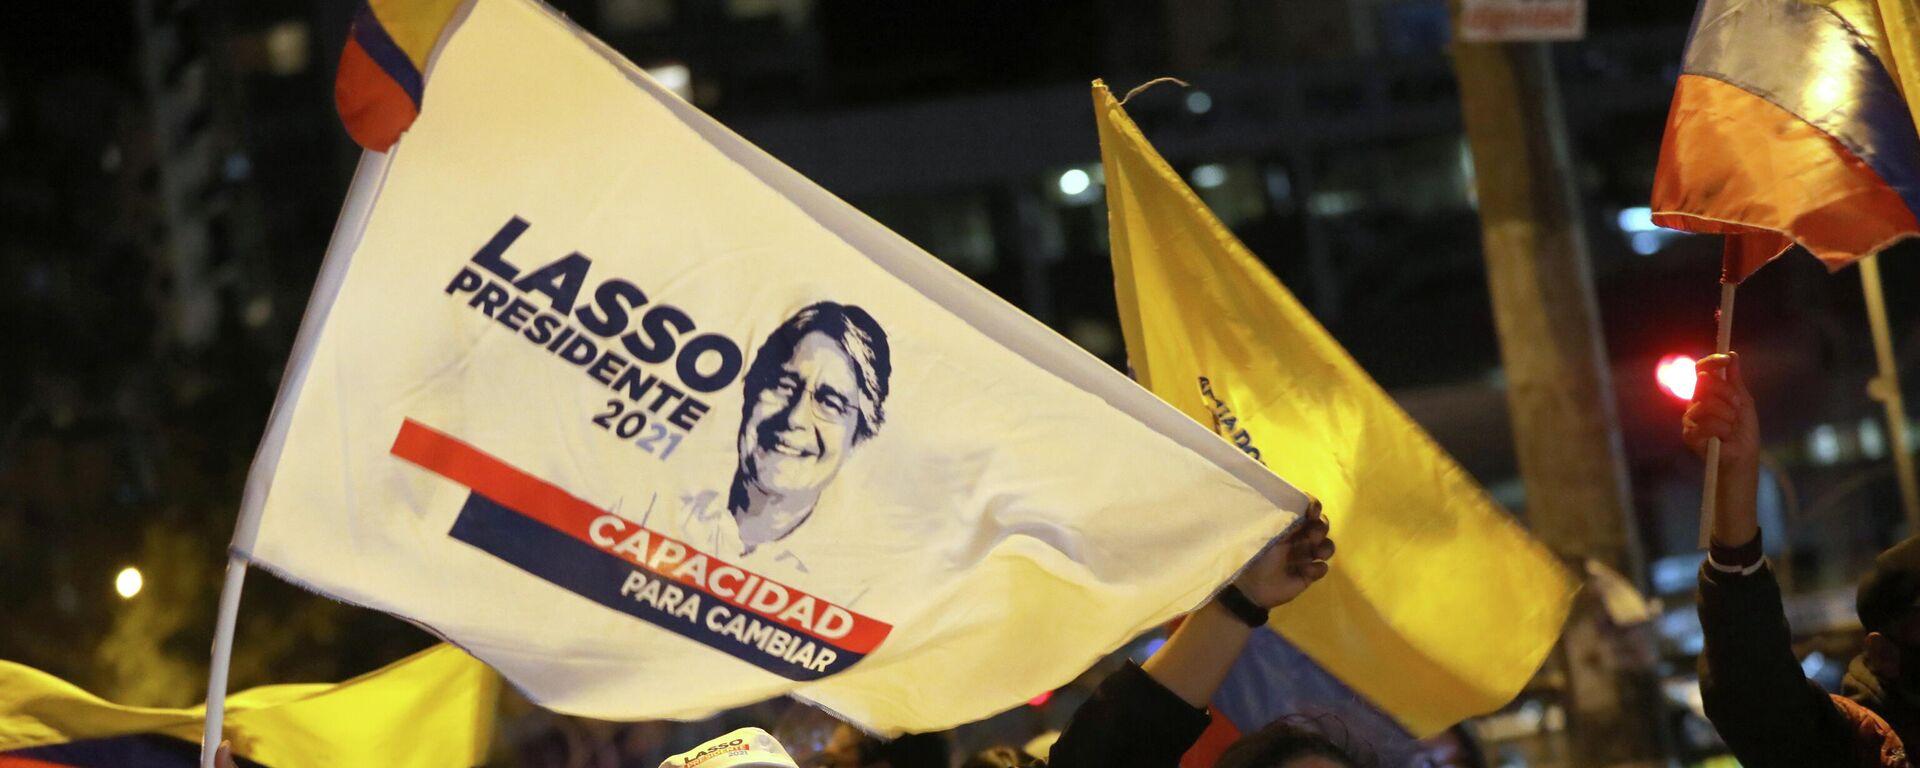 Partidarios de Guillermo Lasso, presidente electo de Ecuador - Sputnik Mundo, 1920, 16.04.2021